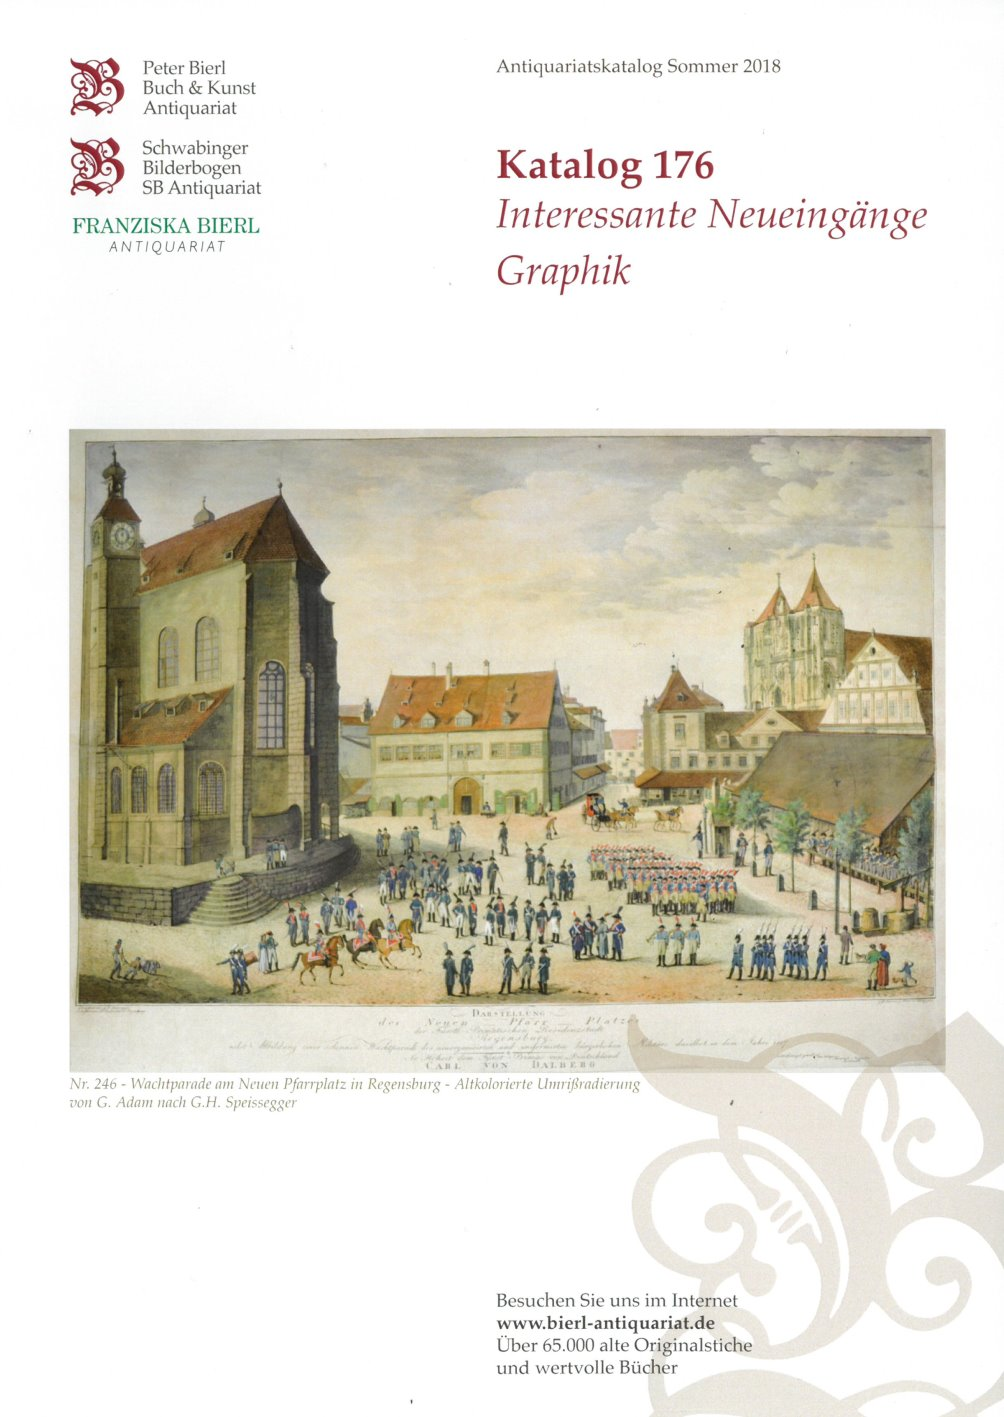 Katalog 176 - Interessante Neueingänge